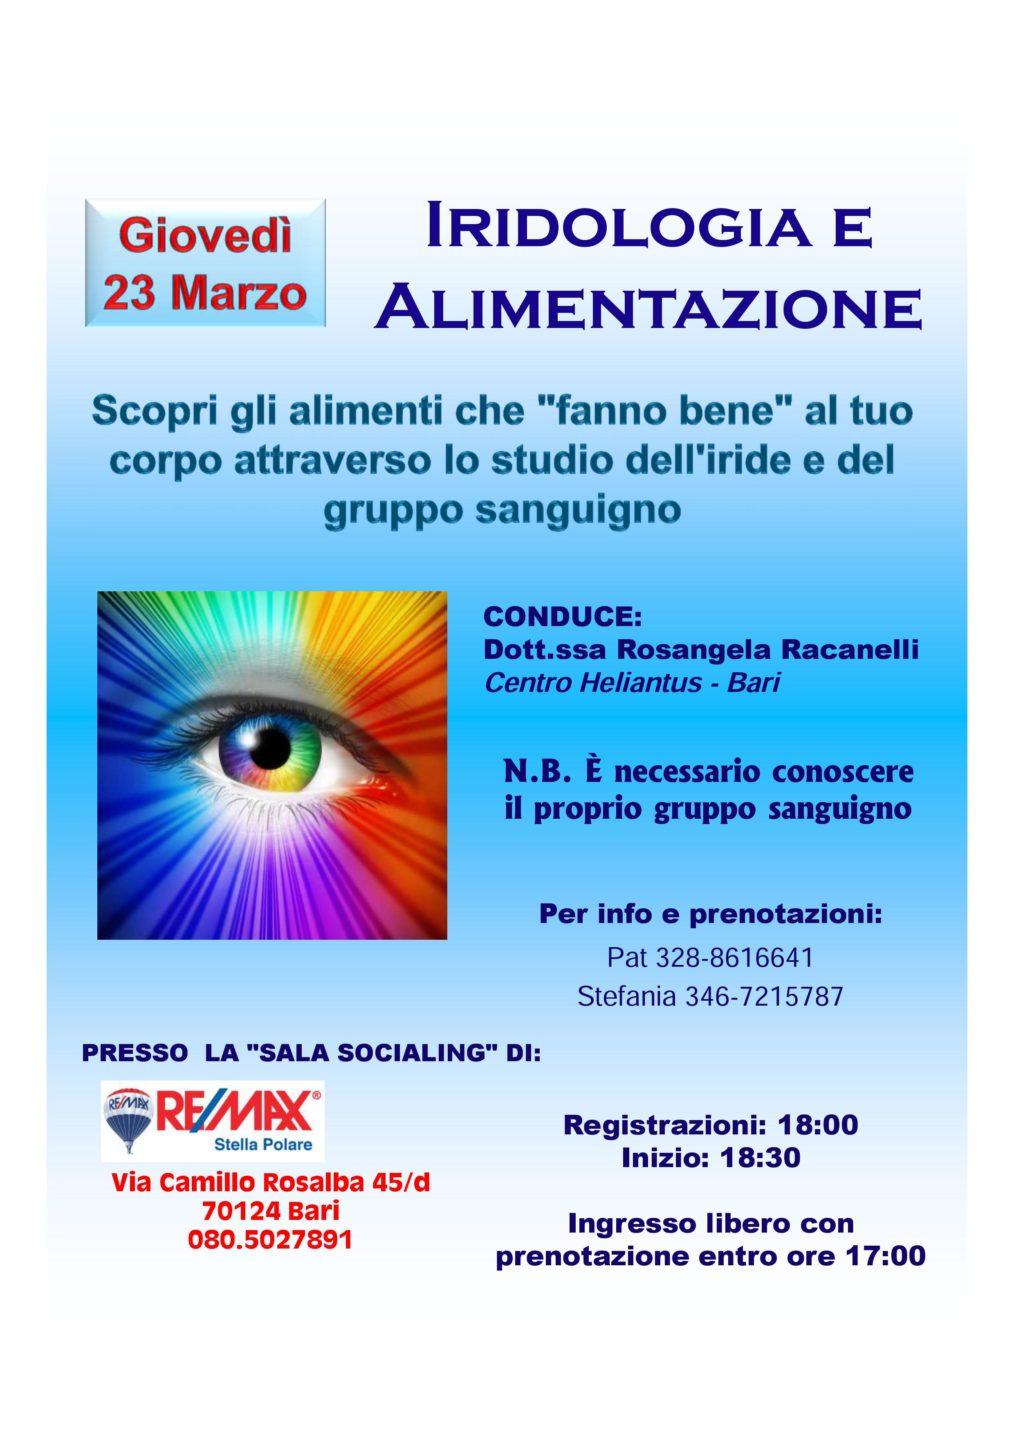 evento-iridologia-23-marzo